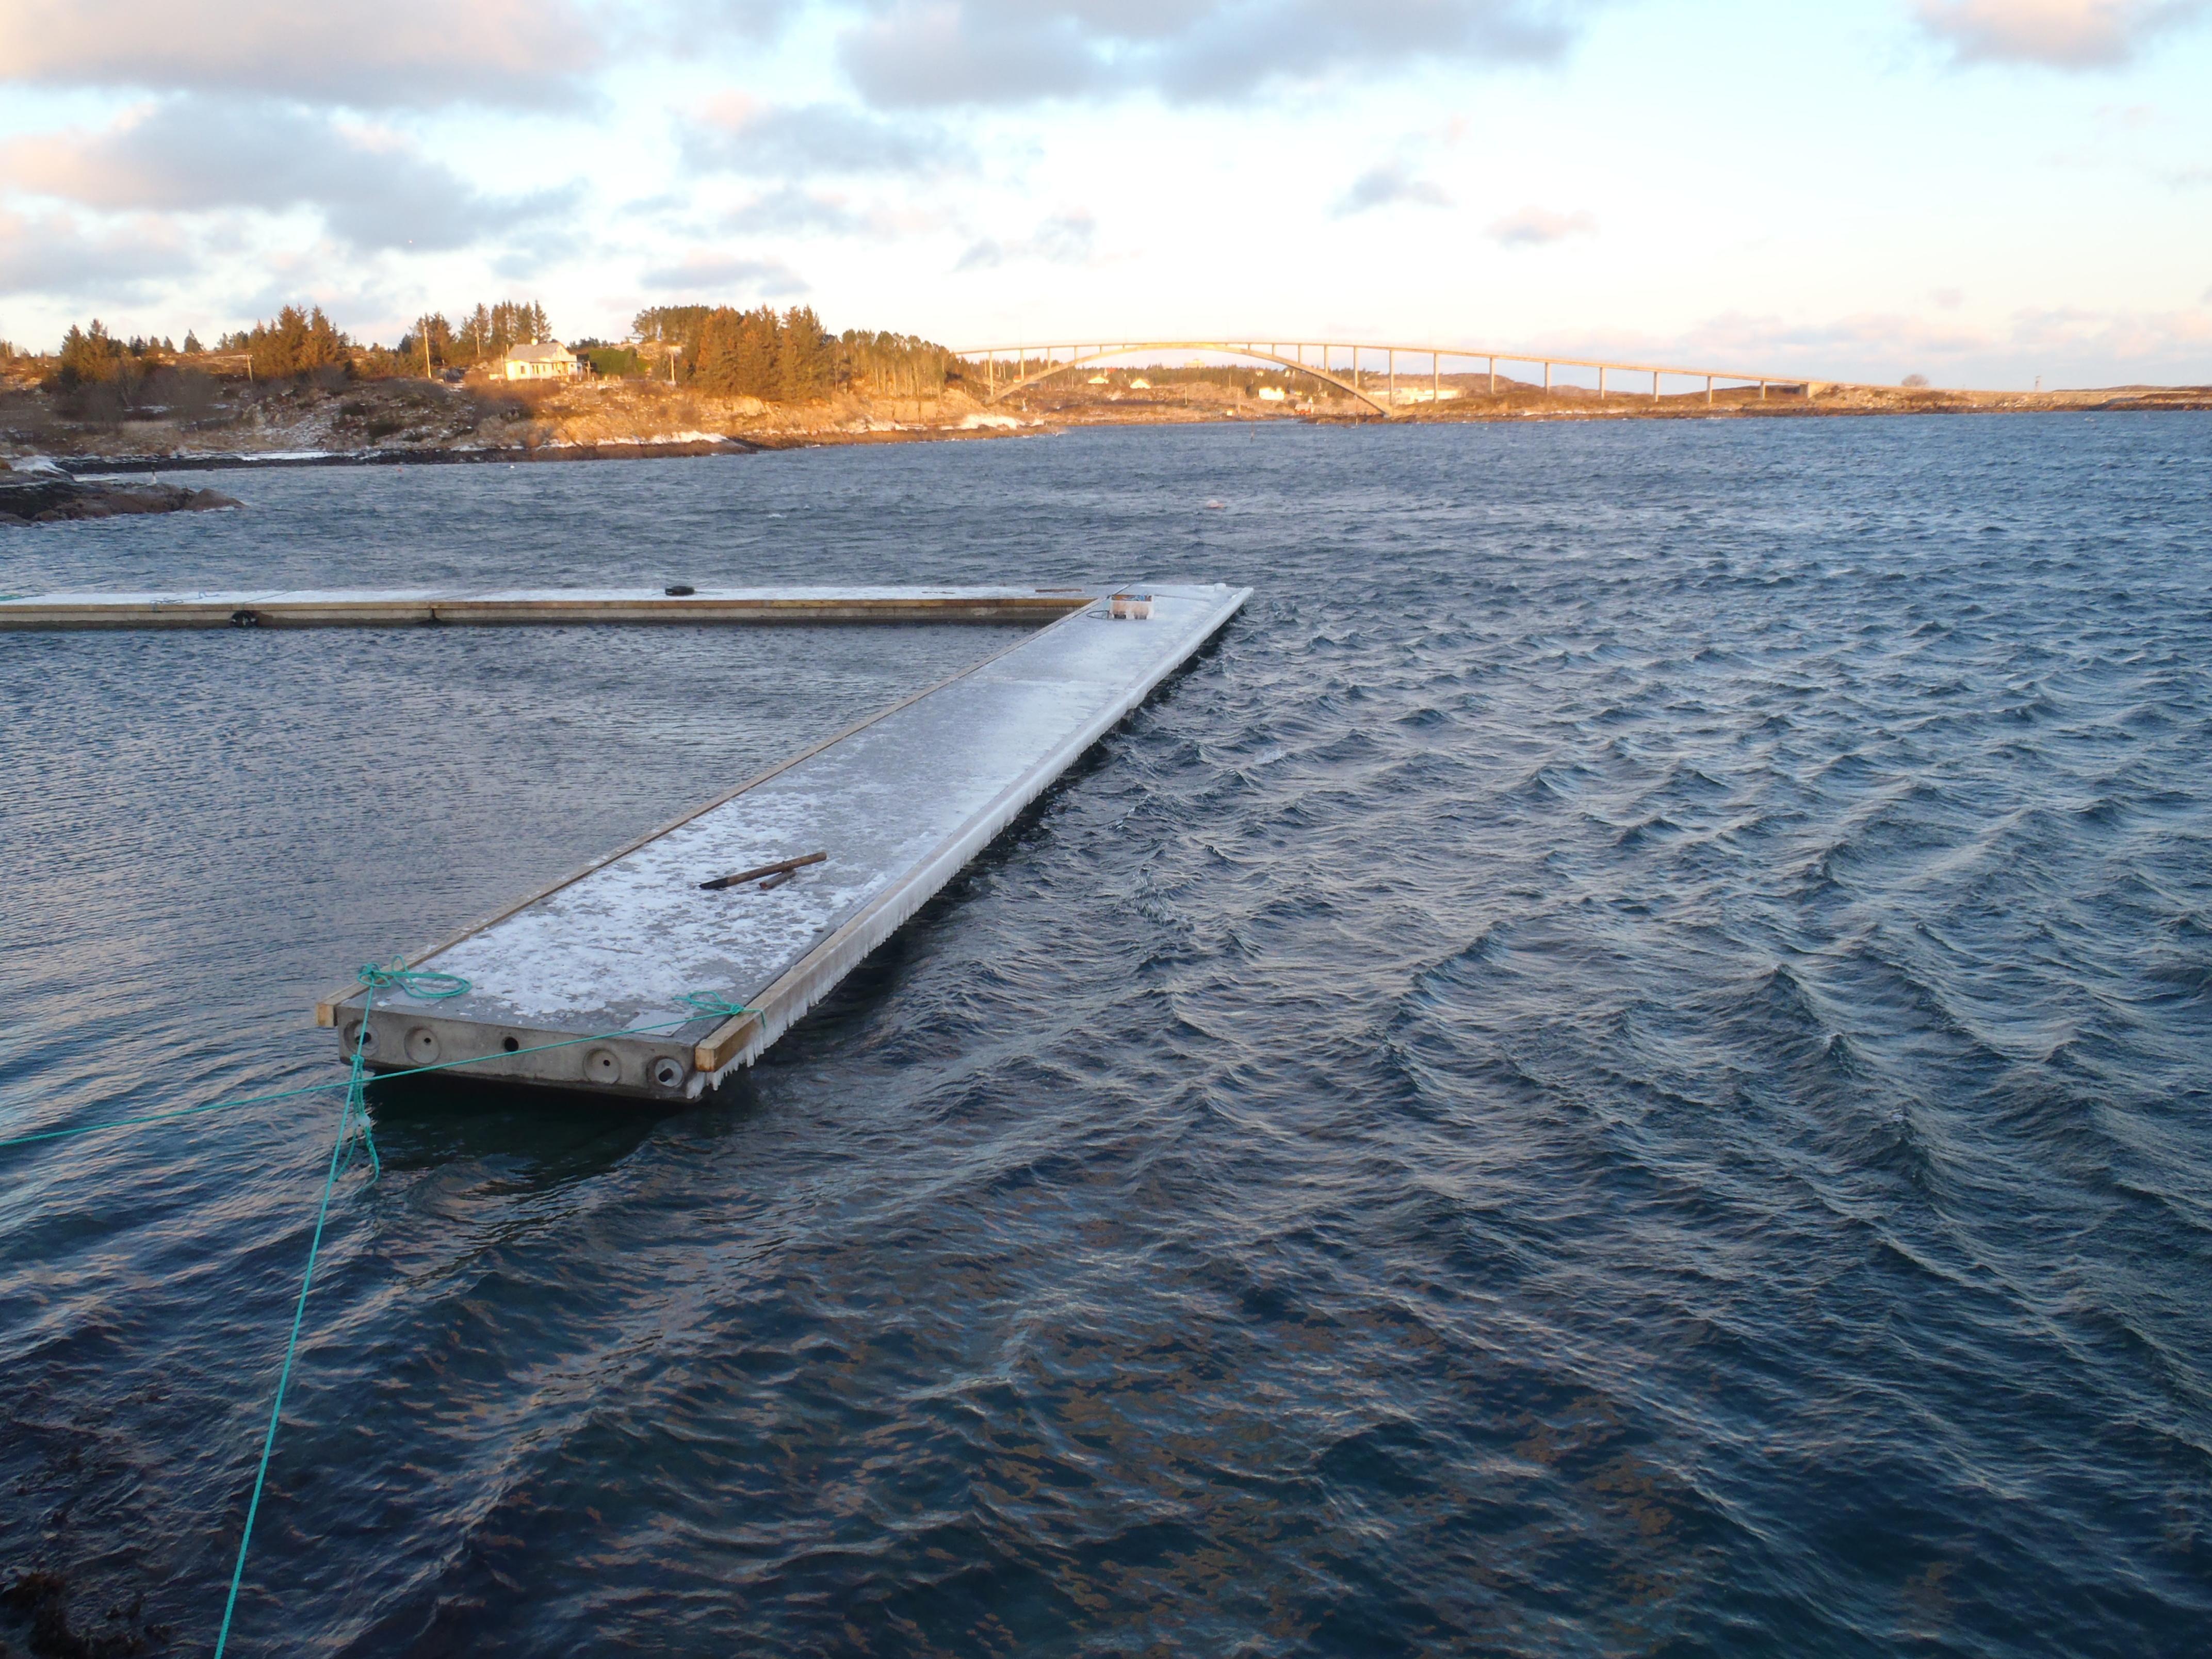 https://www.marinasolutions.no/uploads/Frøya-6.JPG